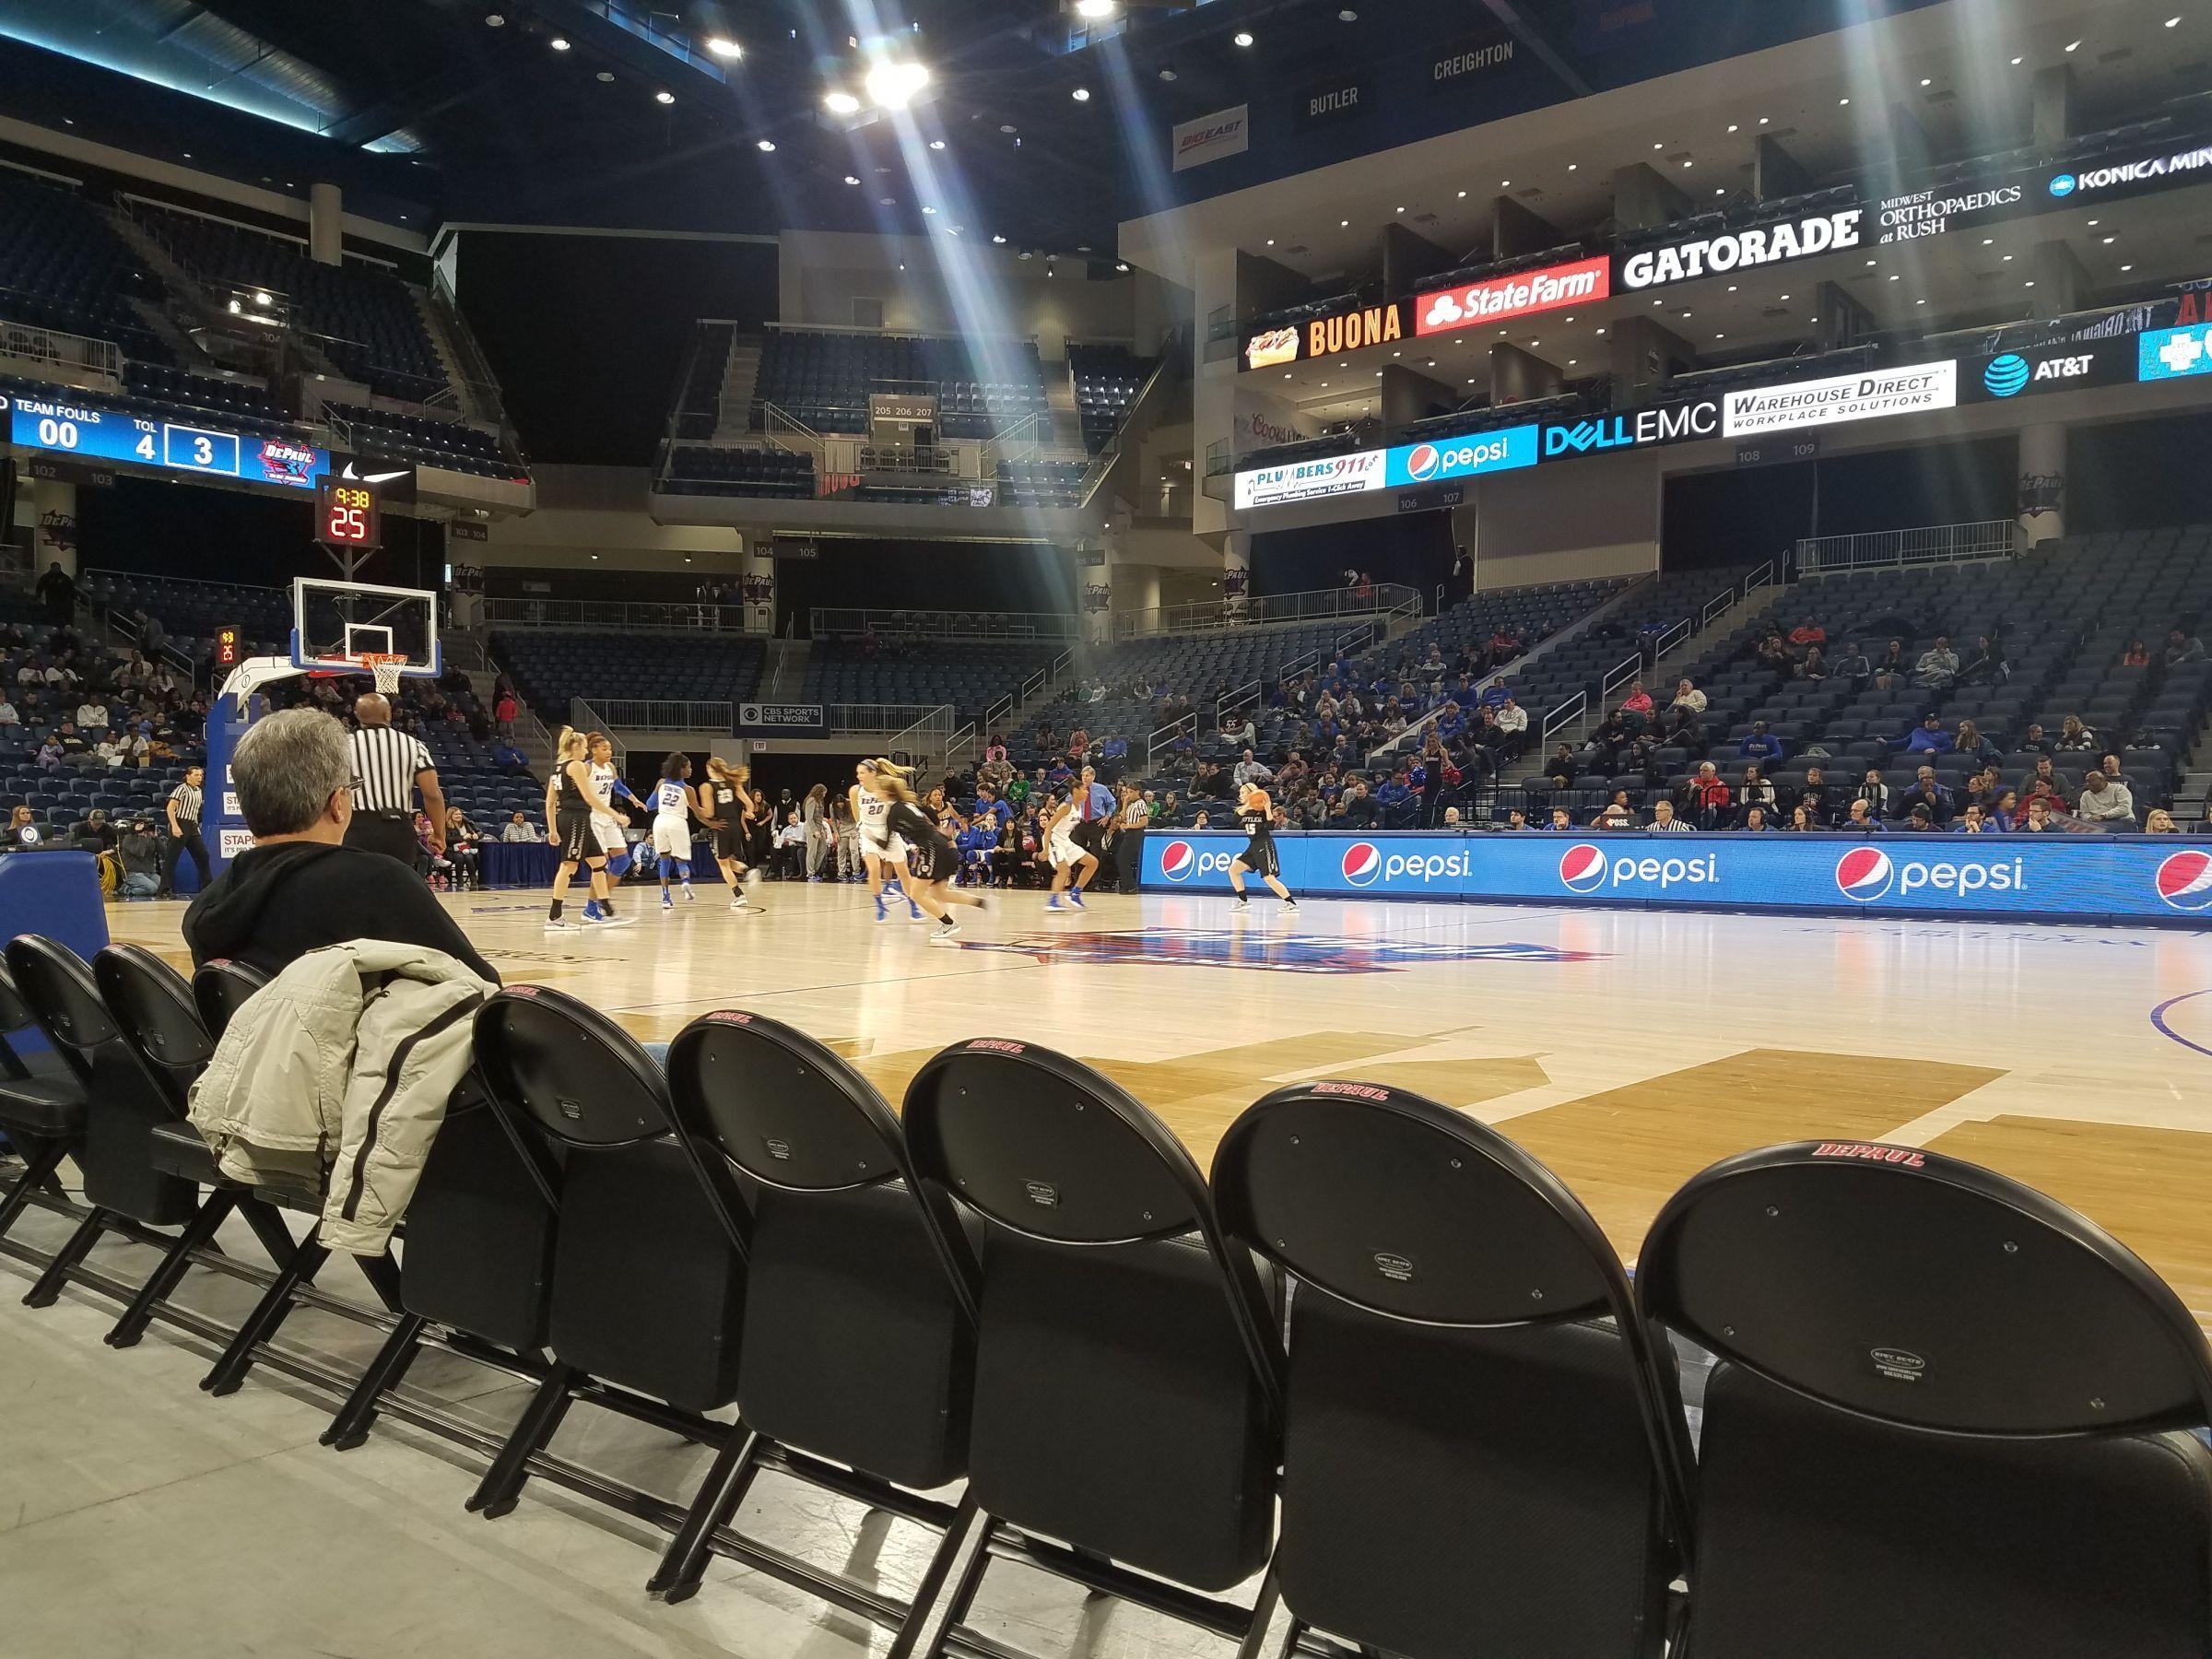 Exterior: Wintrust Arena Section 123